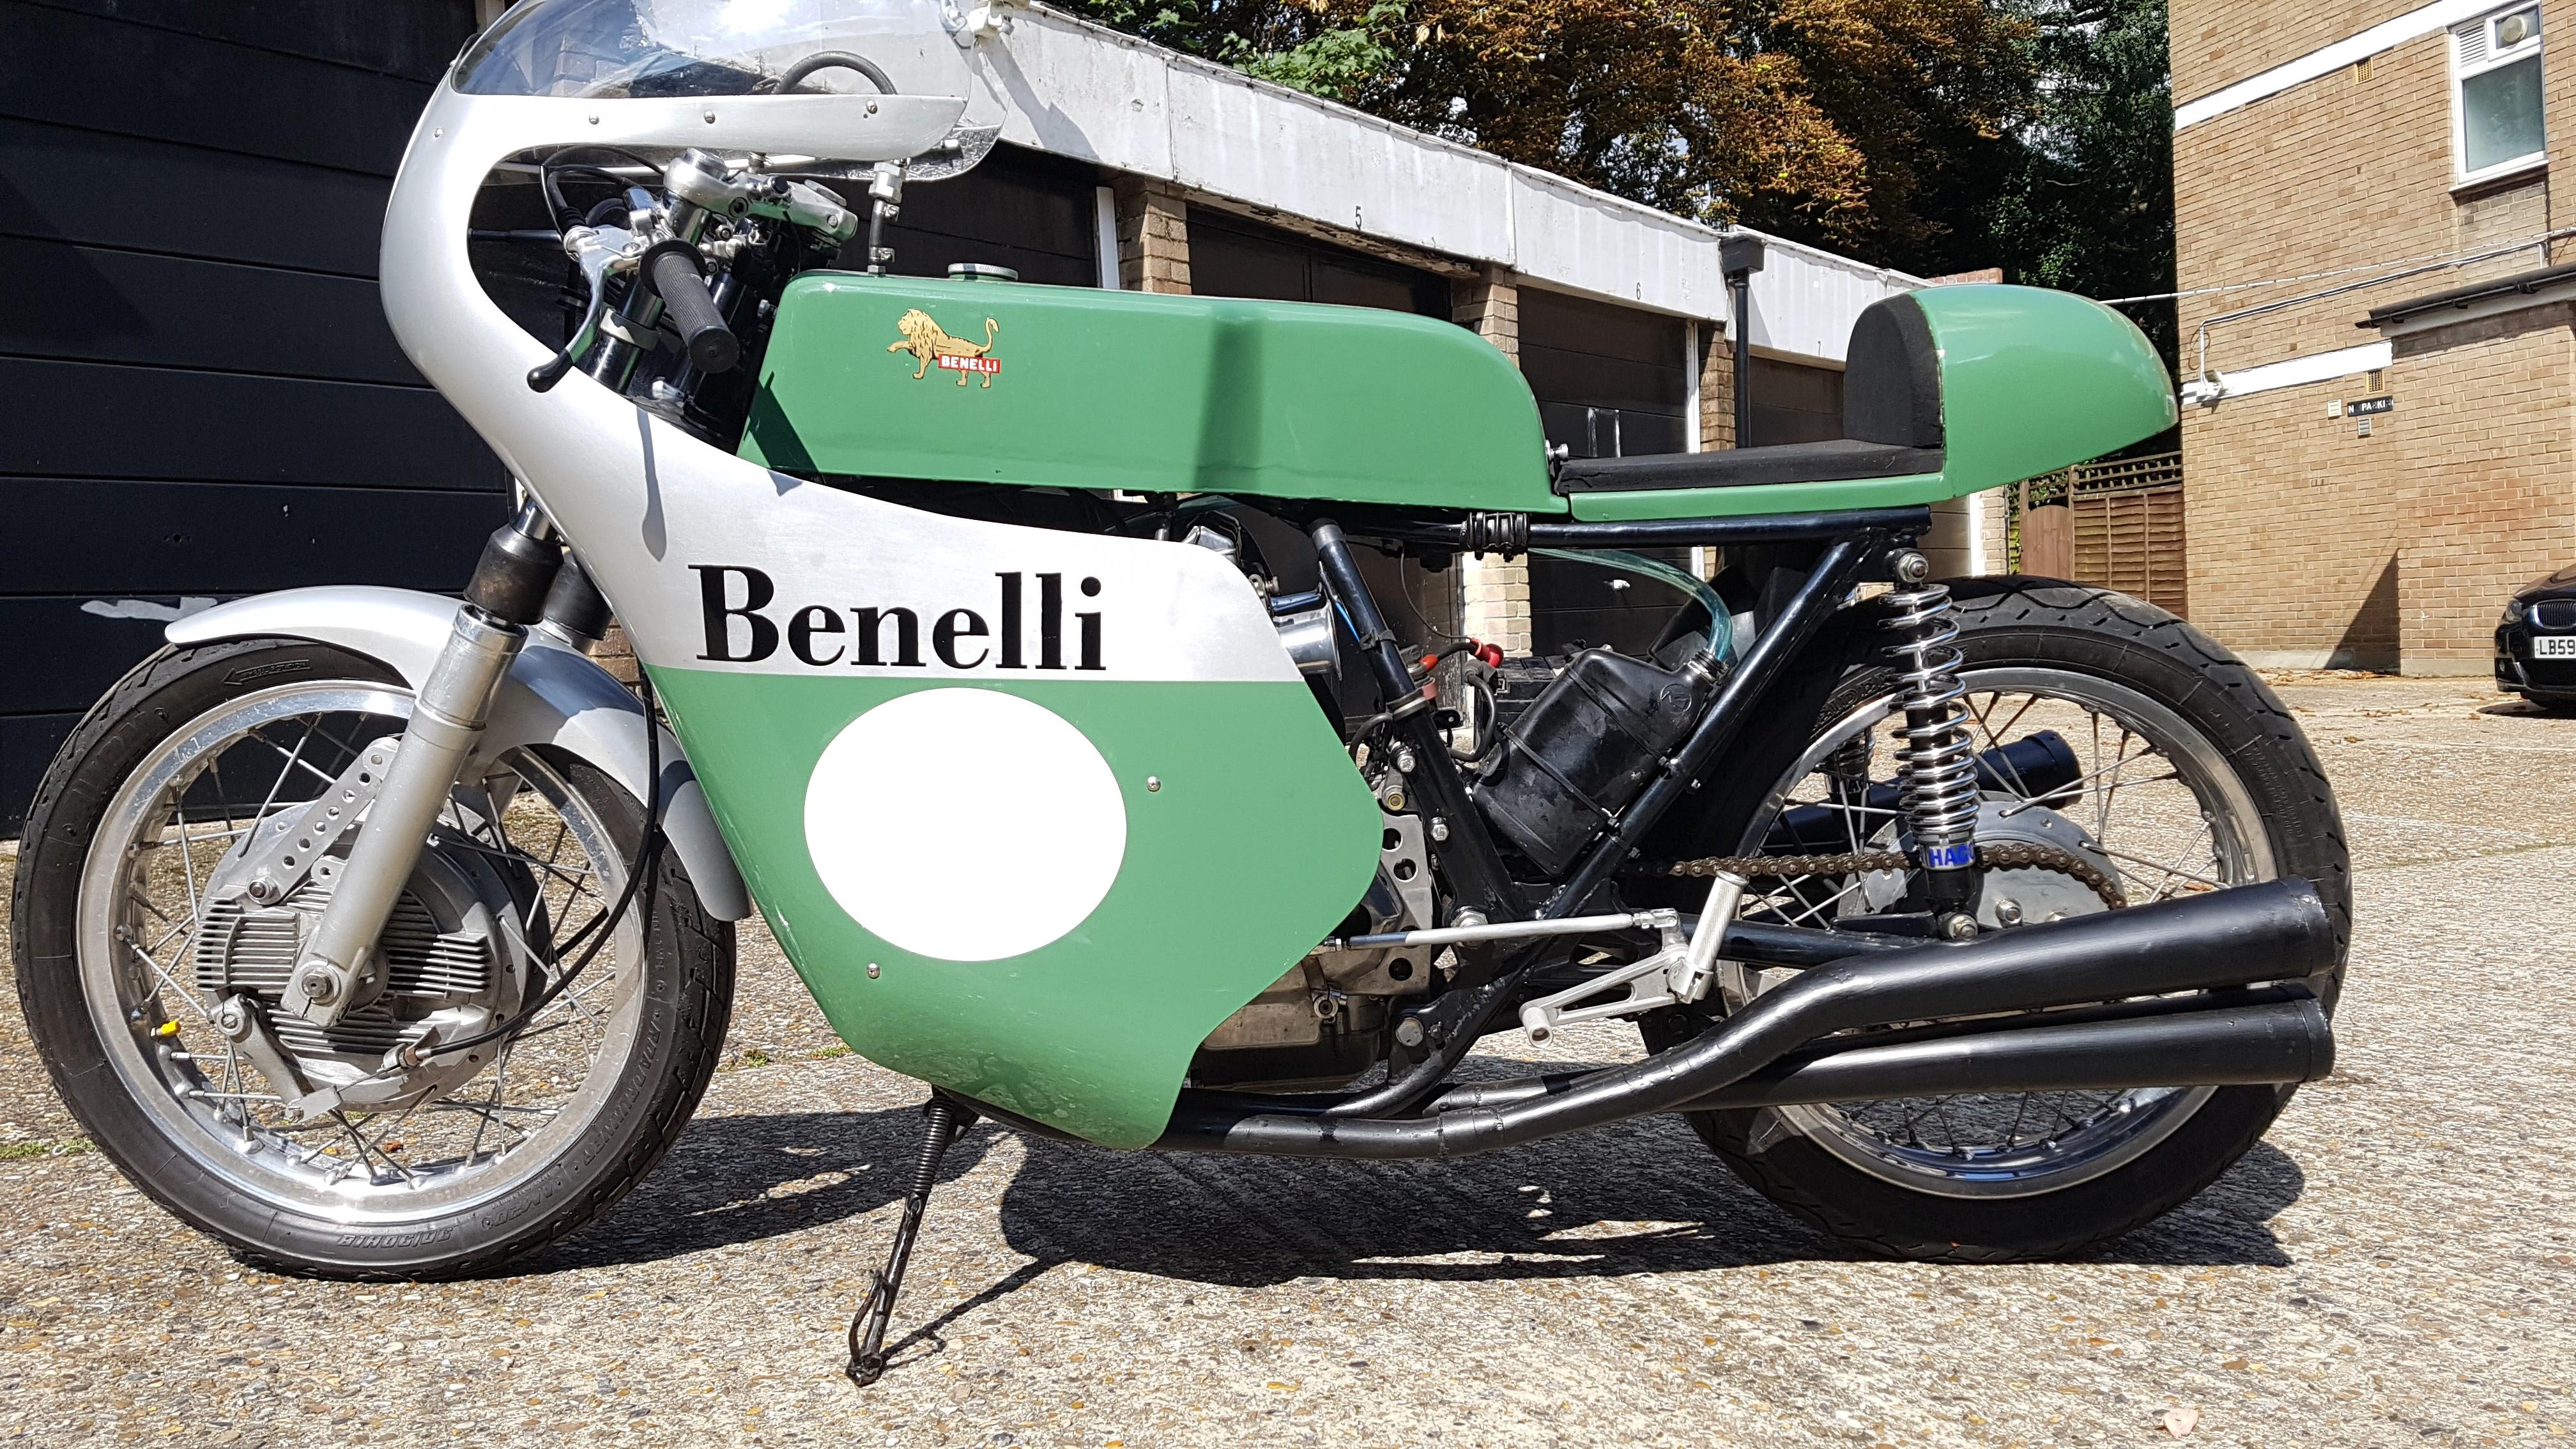 Benelli 500 Pasolini Replica. Ready to race, parade or ride on road. Mot & V5.-20170902_114159.jpg